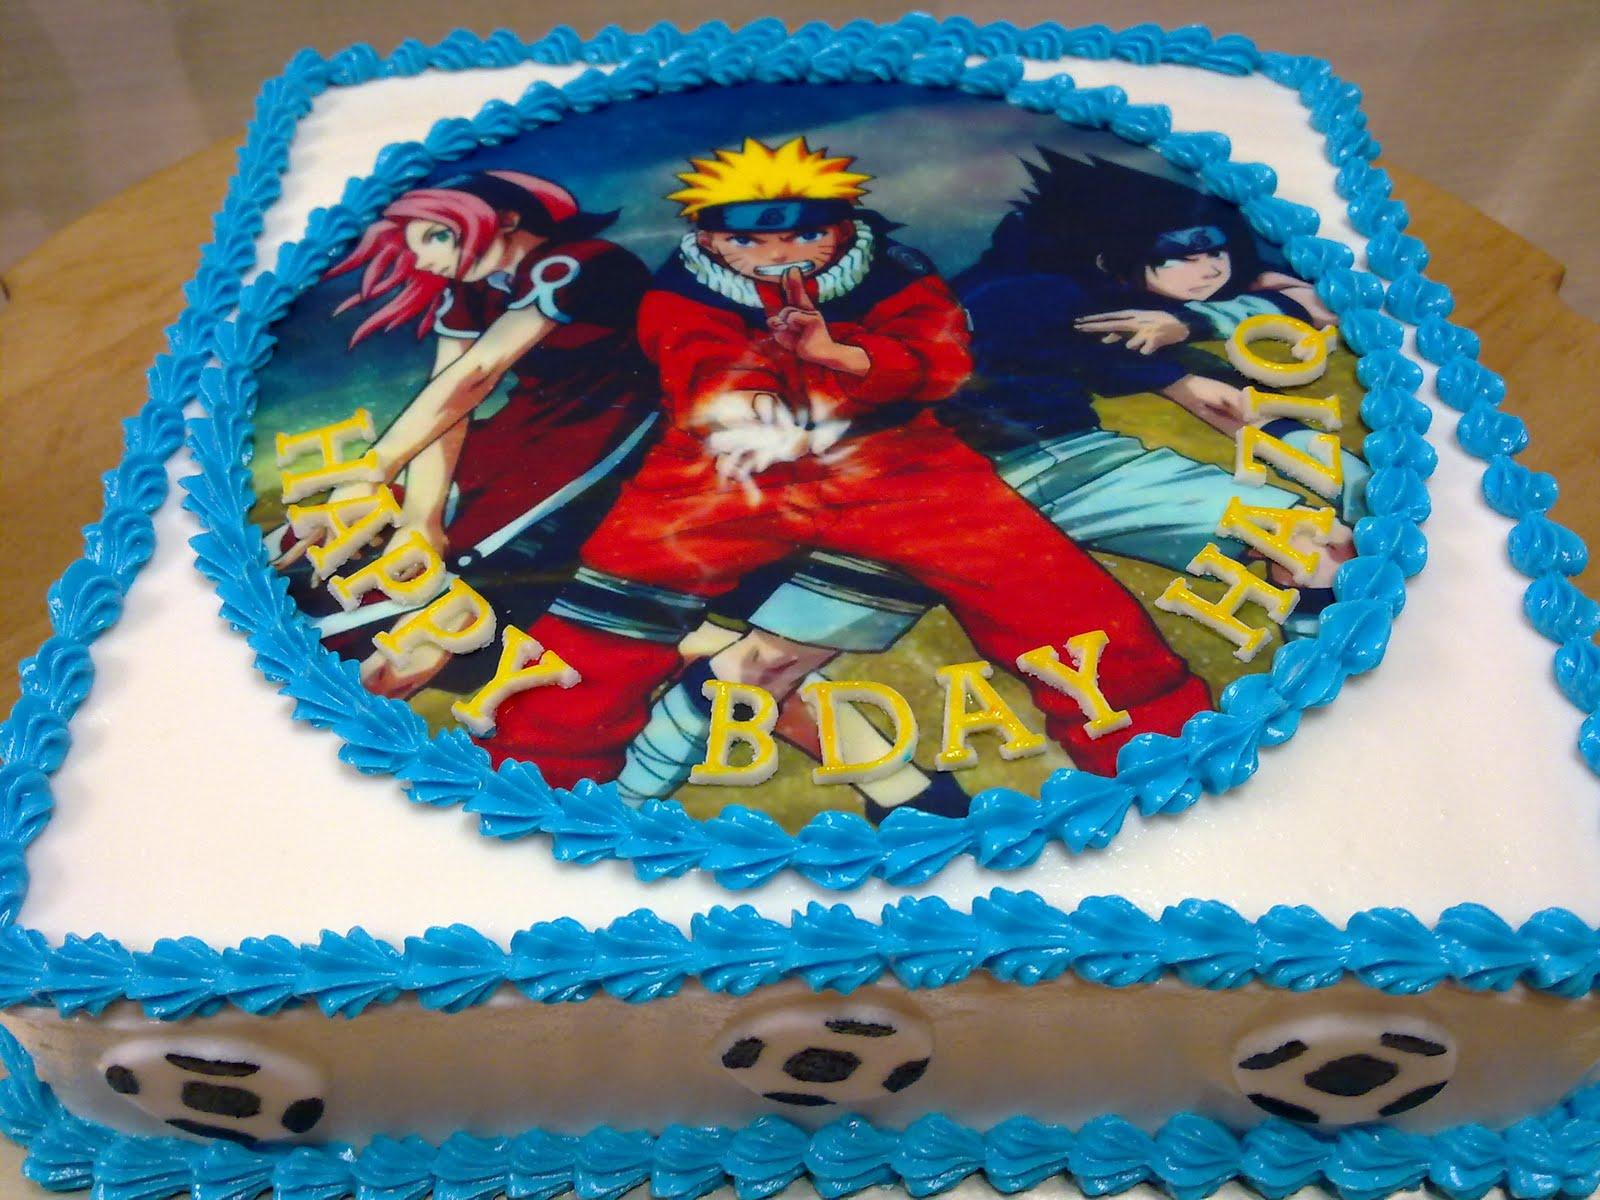 Masterpiece Home Made Cakes Cartoon Character Naruto